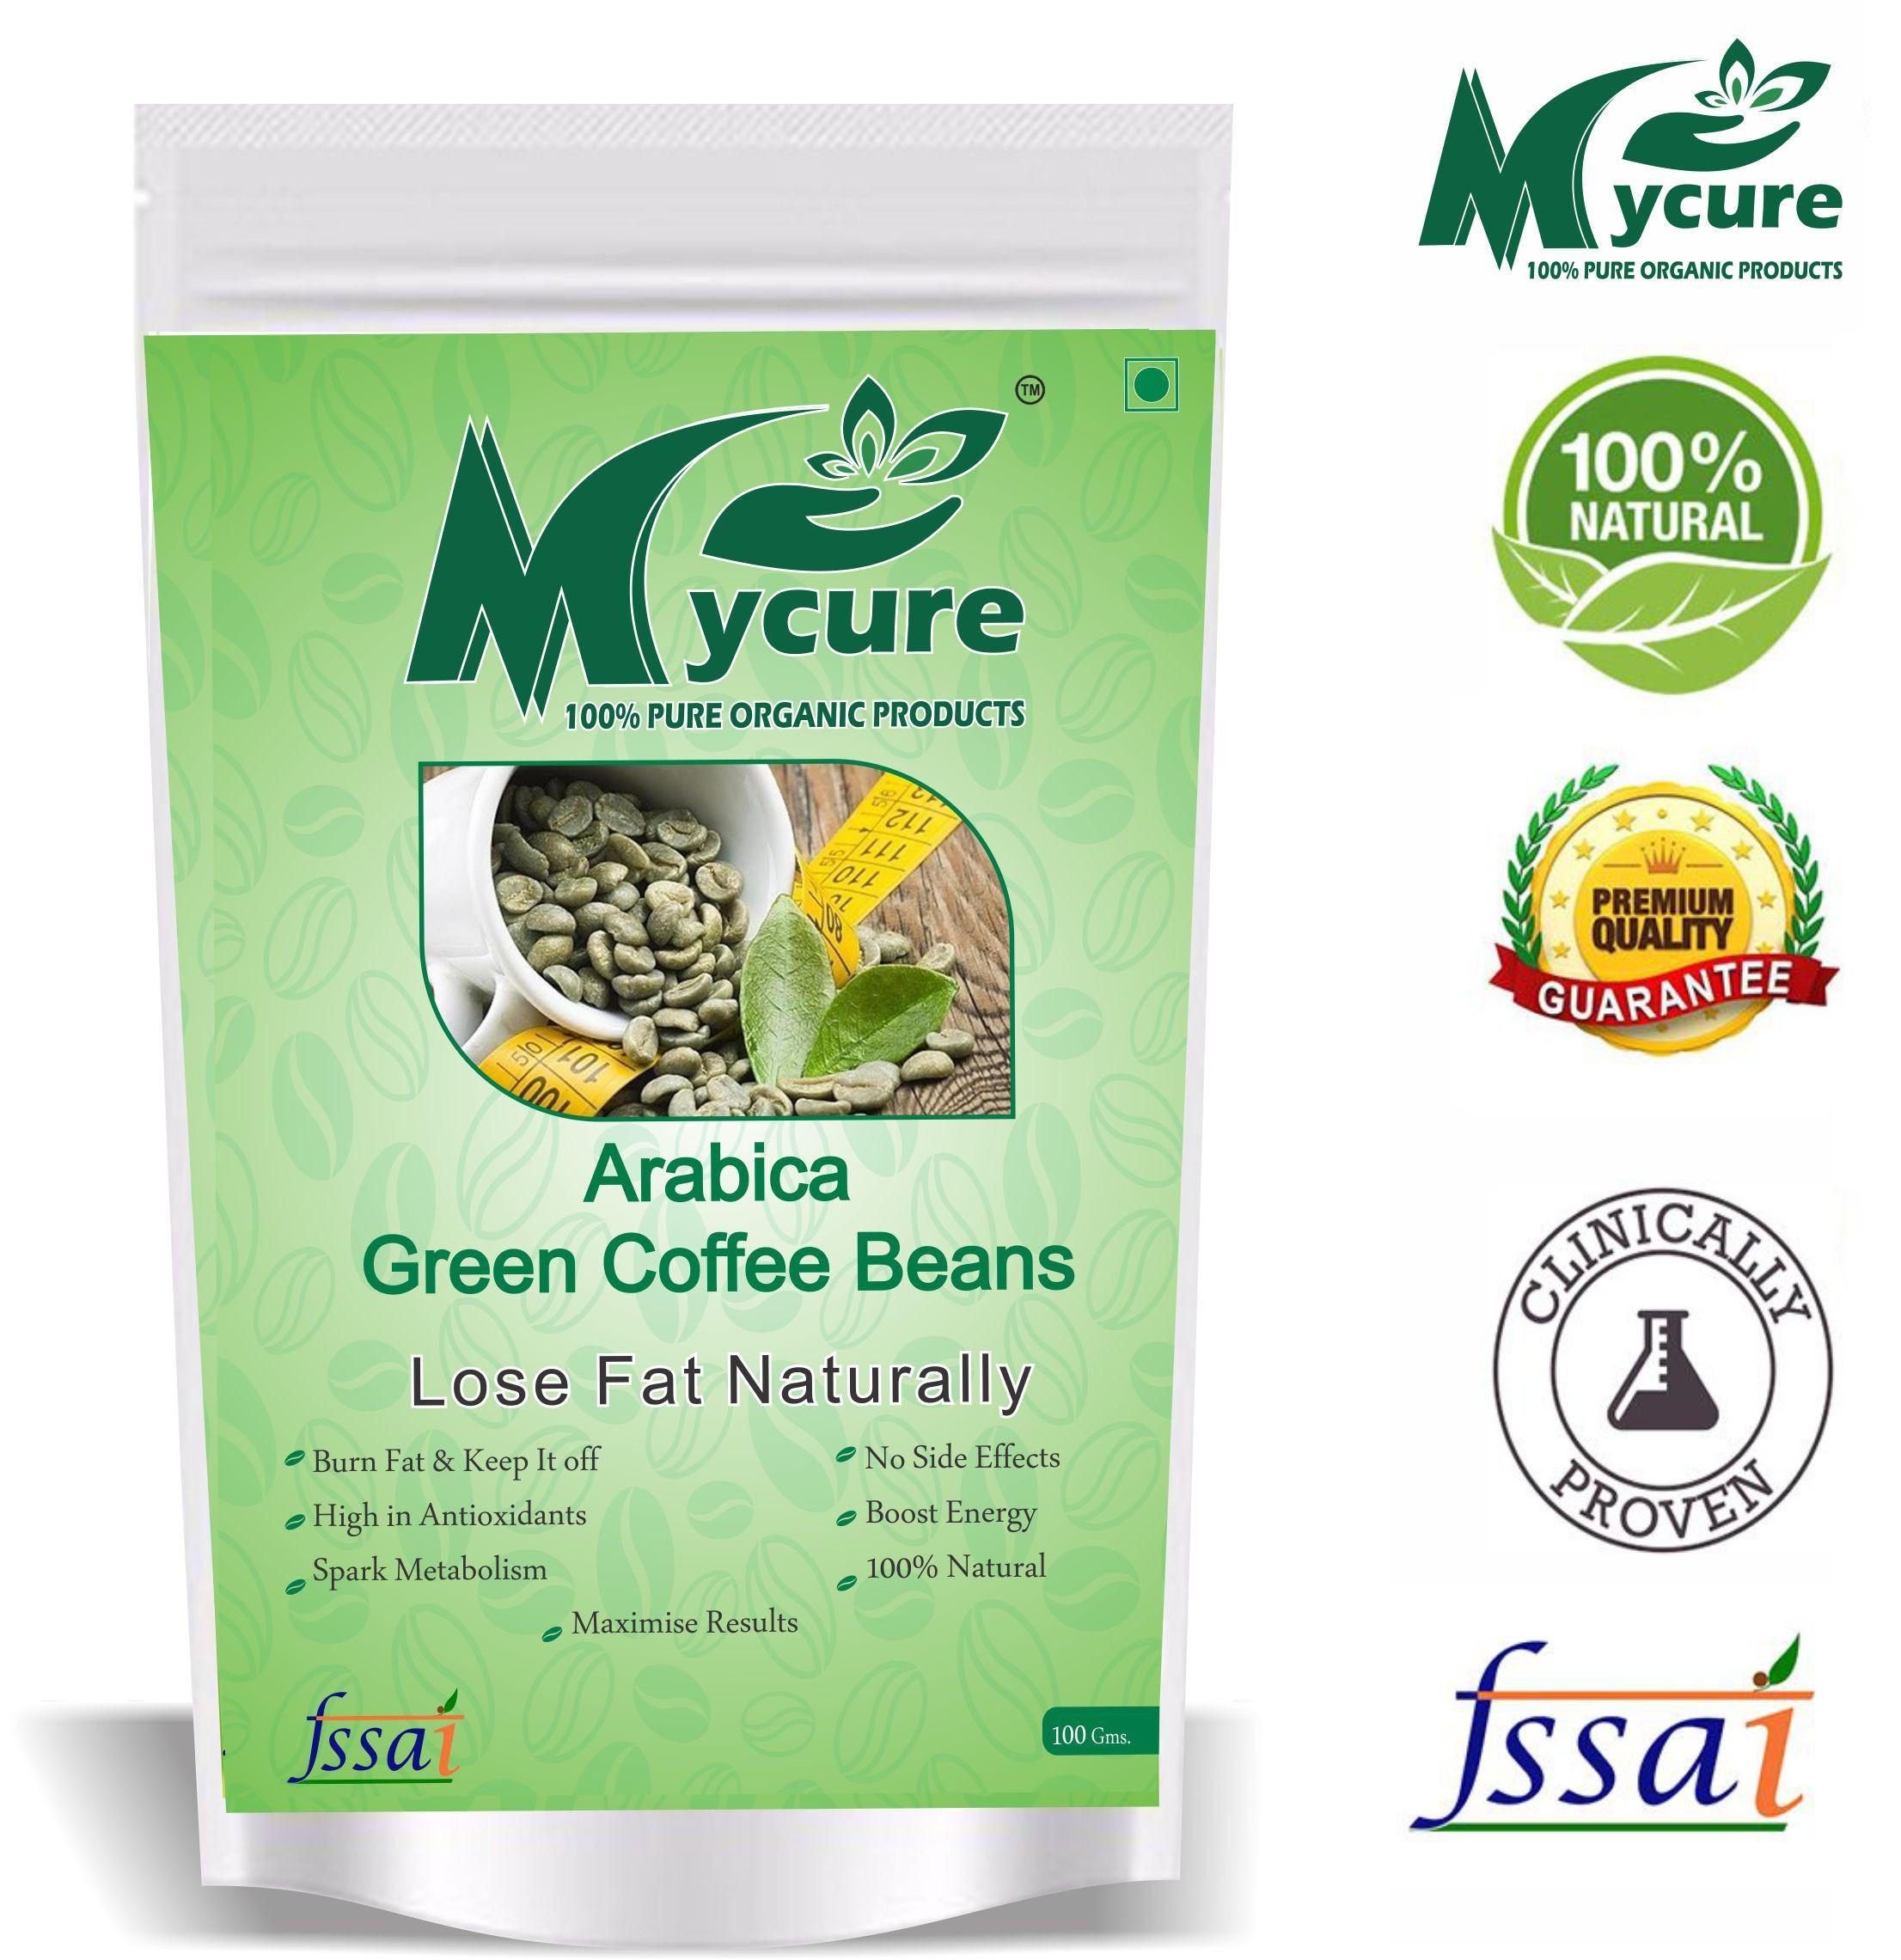 mycure Organic Green Coffee Beans SDL 1 b557d